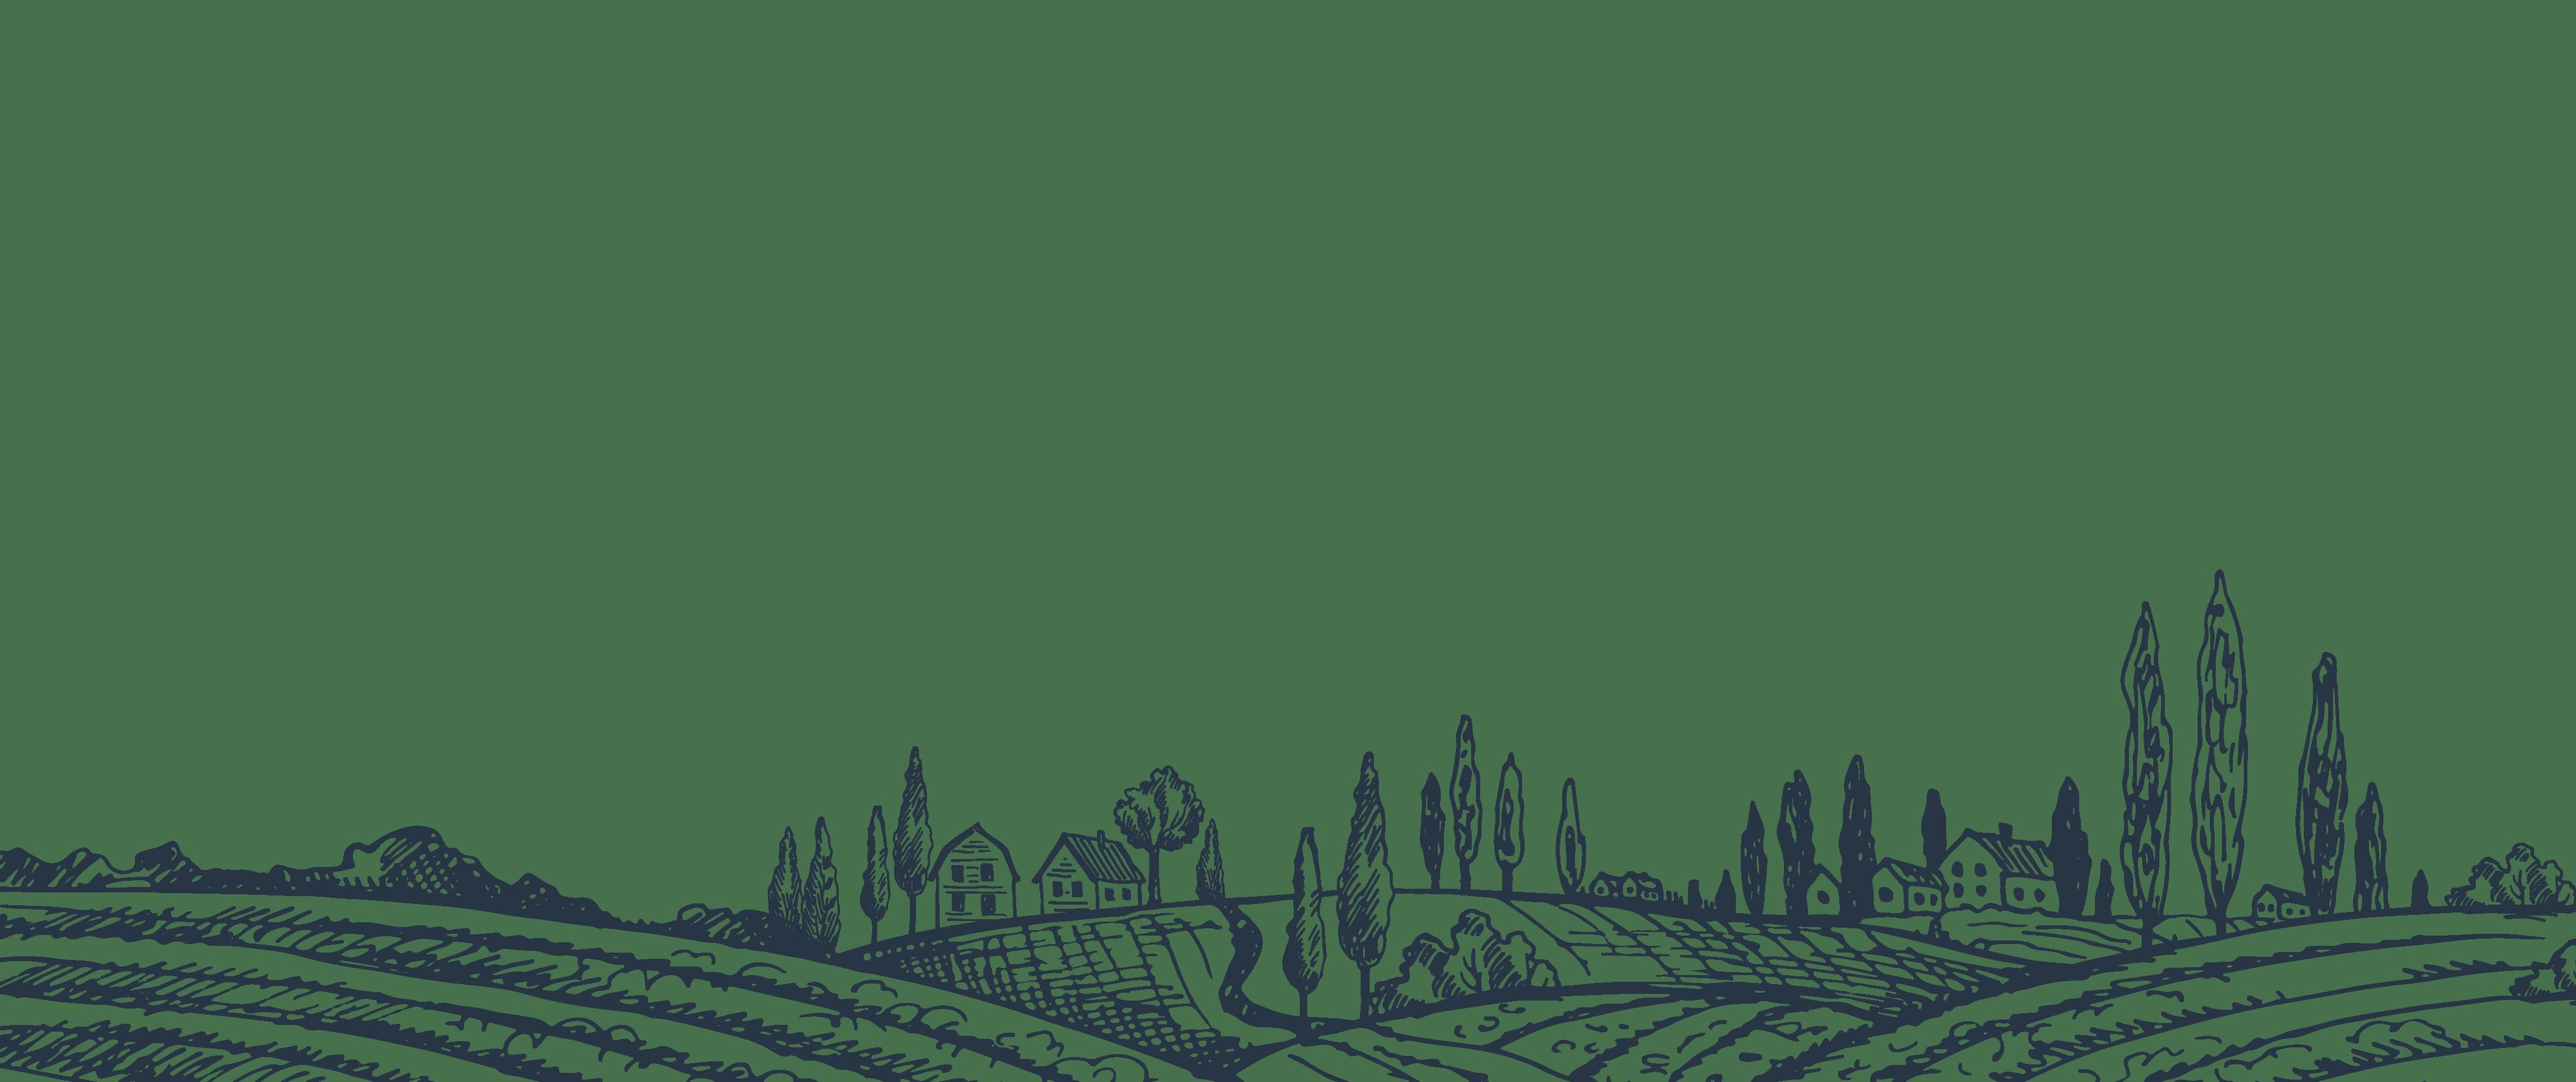 custom farm illustration for agtech marketing company